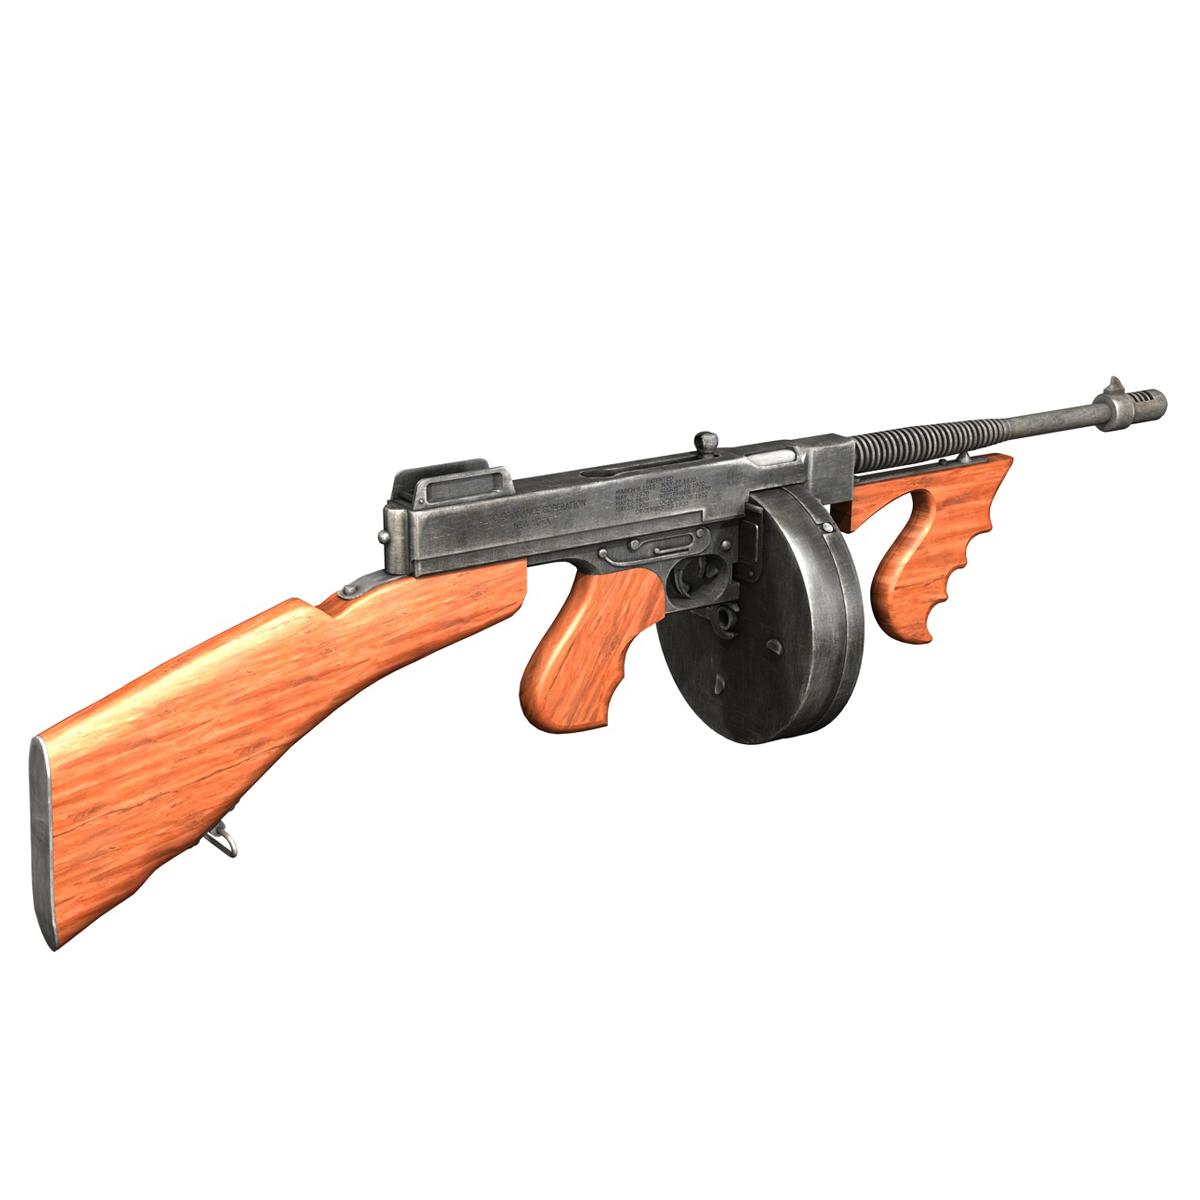 colt model1921 thompson submachine gun 3d model 3ds c4d lwo obj 264706